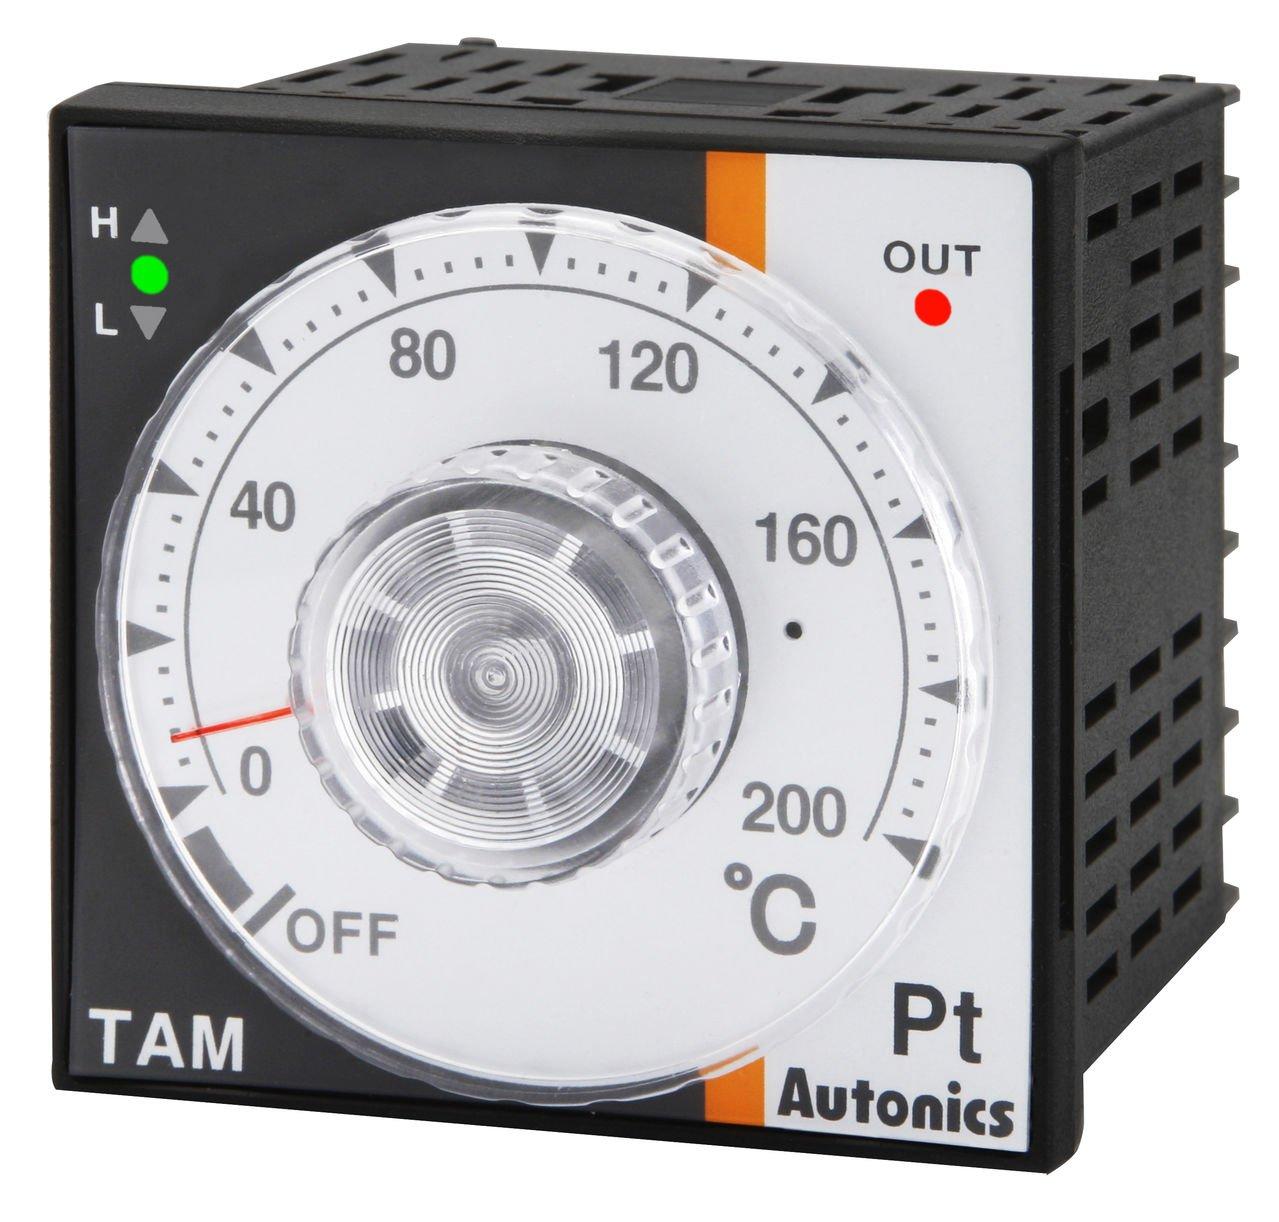 Autonics TAM-B4SP1C Temp Control, DIN W72XH72mm, Analog, PID Control, SSR Output, RTD Input, 100 C, 100-240 VAC by Autonics USA, Inc